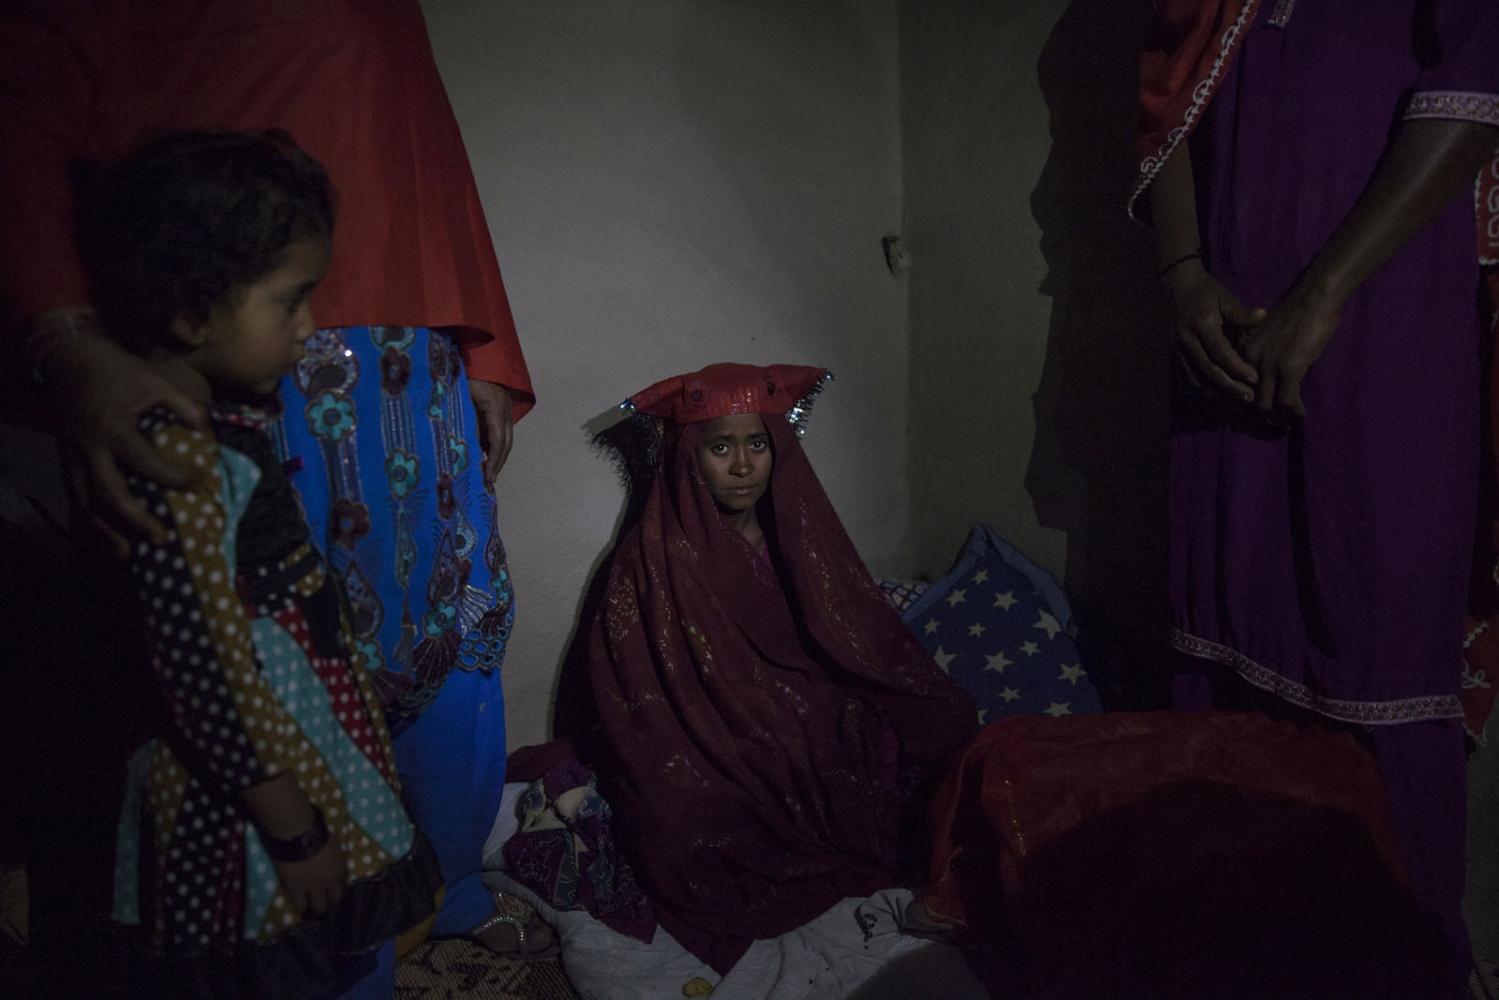 Art and Documentary Photography - Loading Sidi_SouthAsia28.JPG